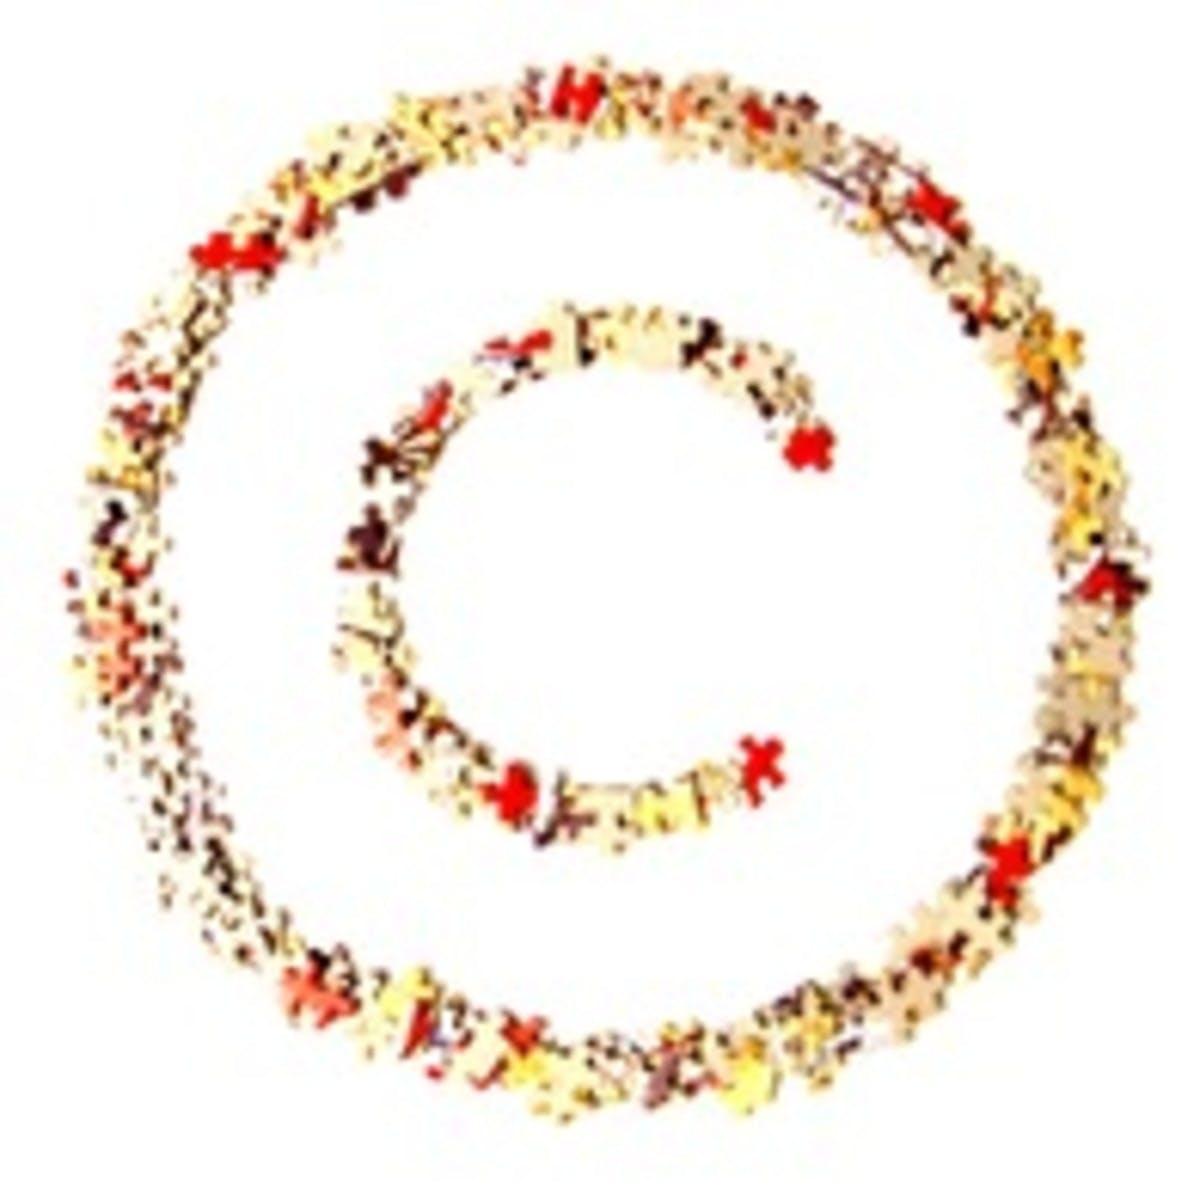 Copyright for Multimedia